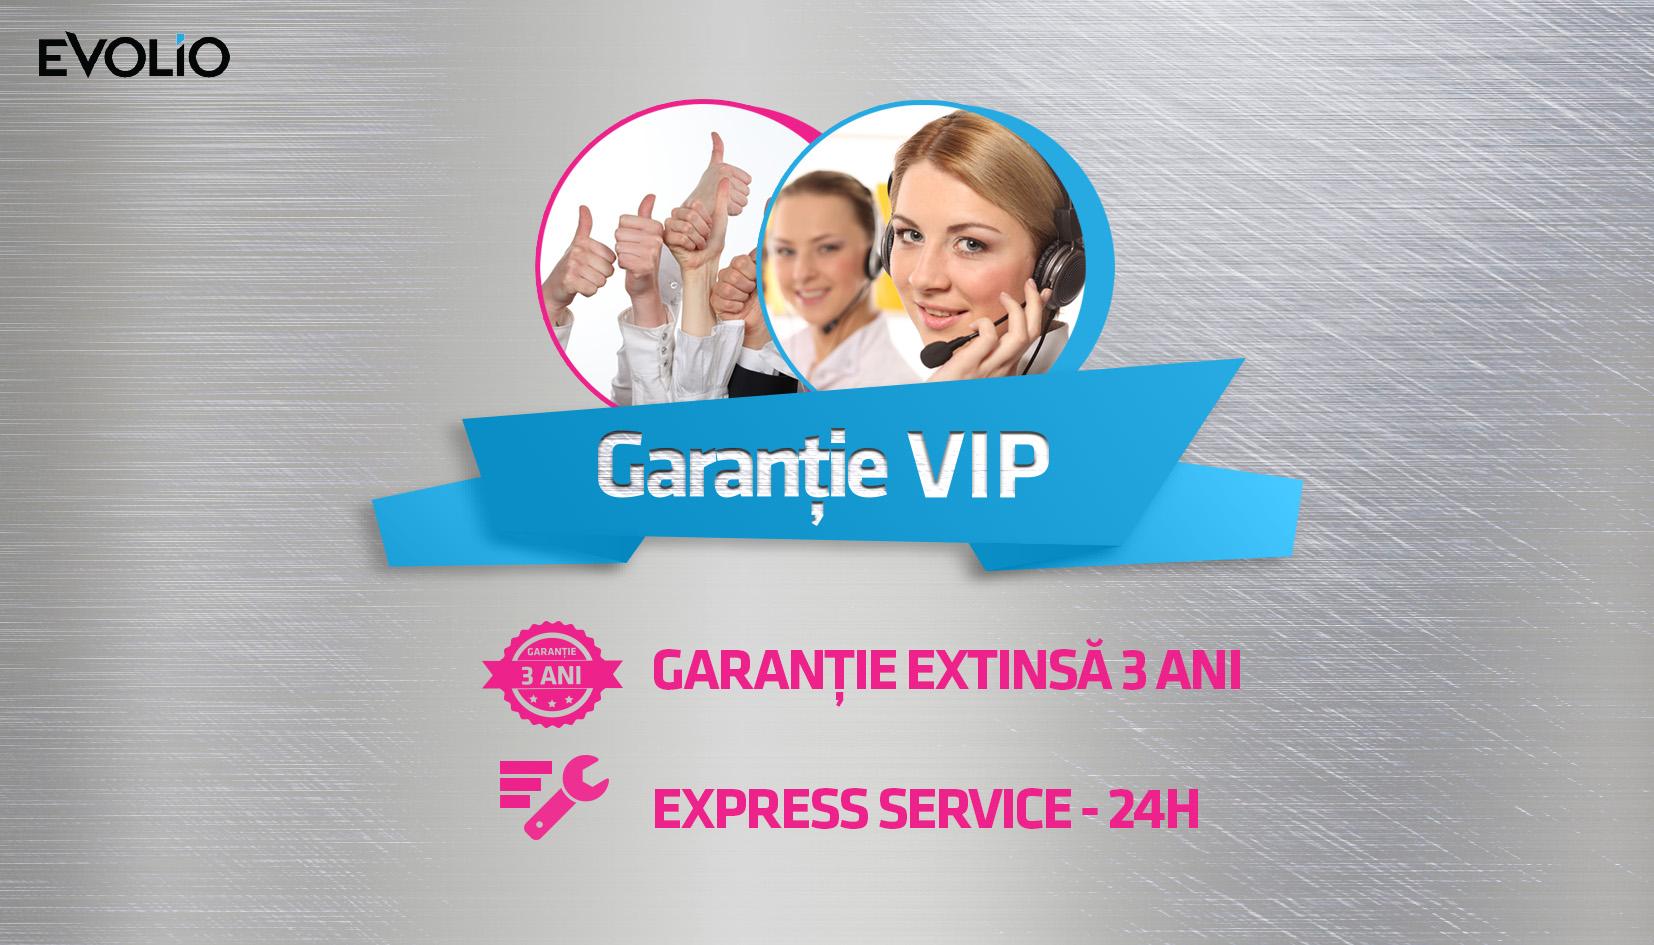 vizual_Garantie_VIP 24h